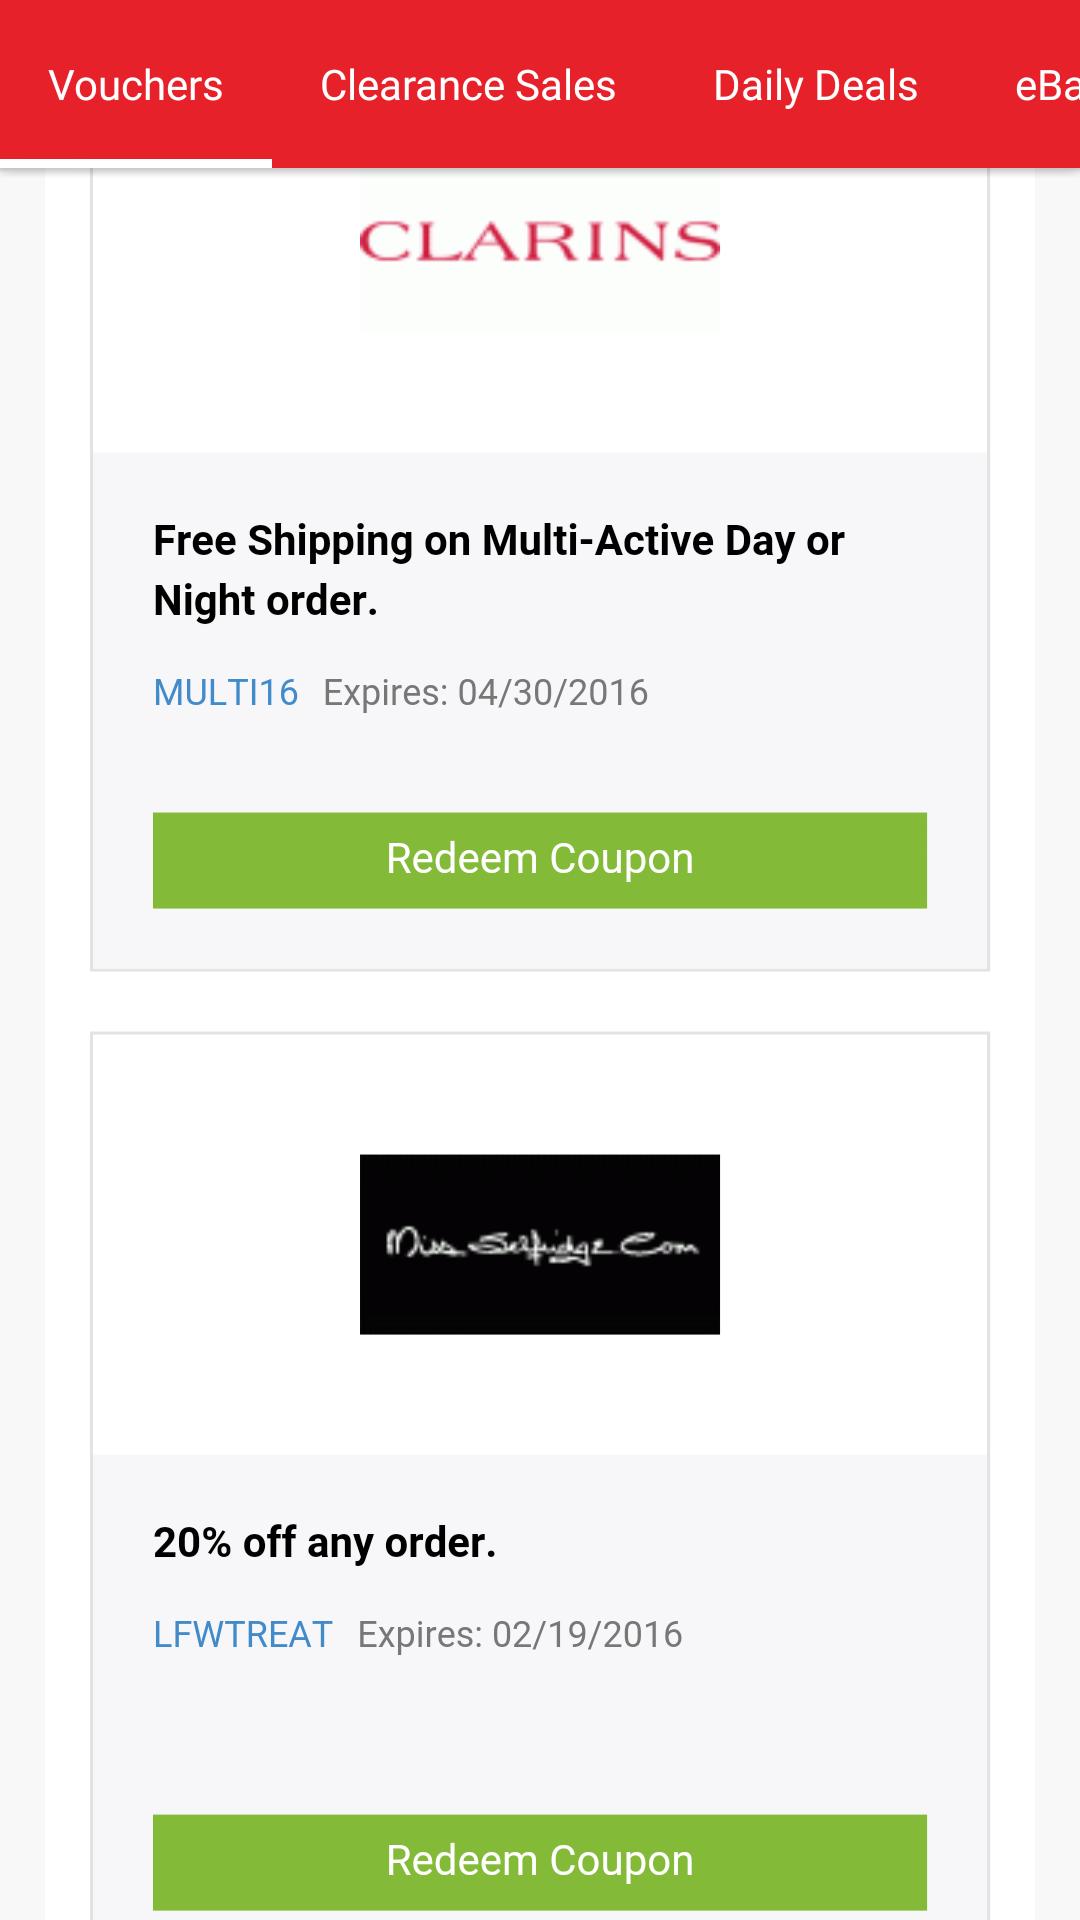 Amazon.com discount coupons